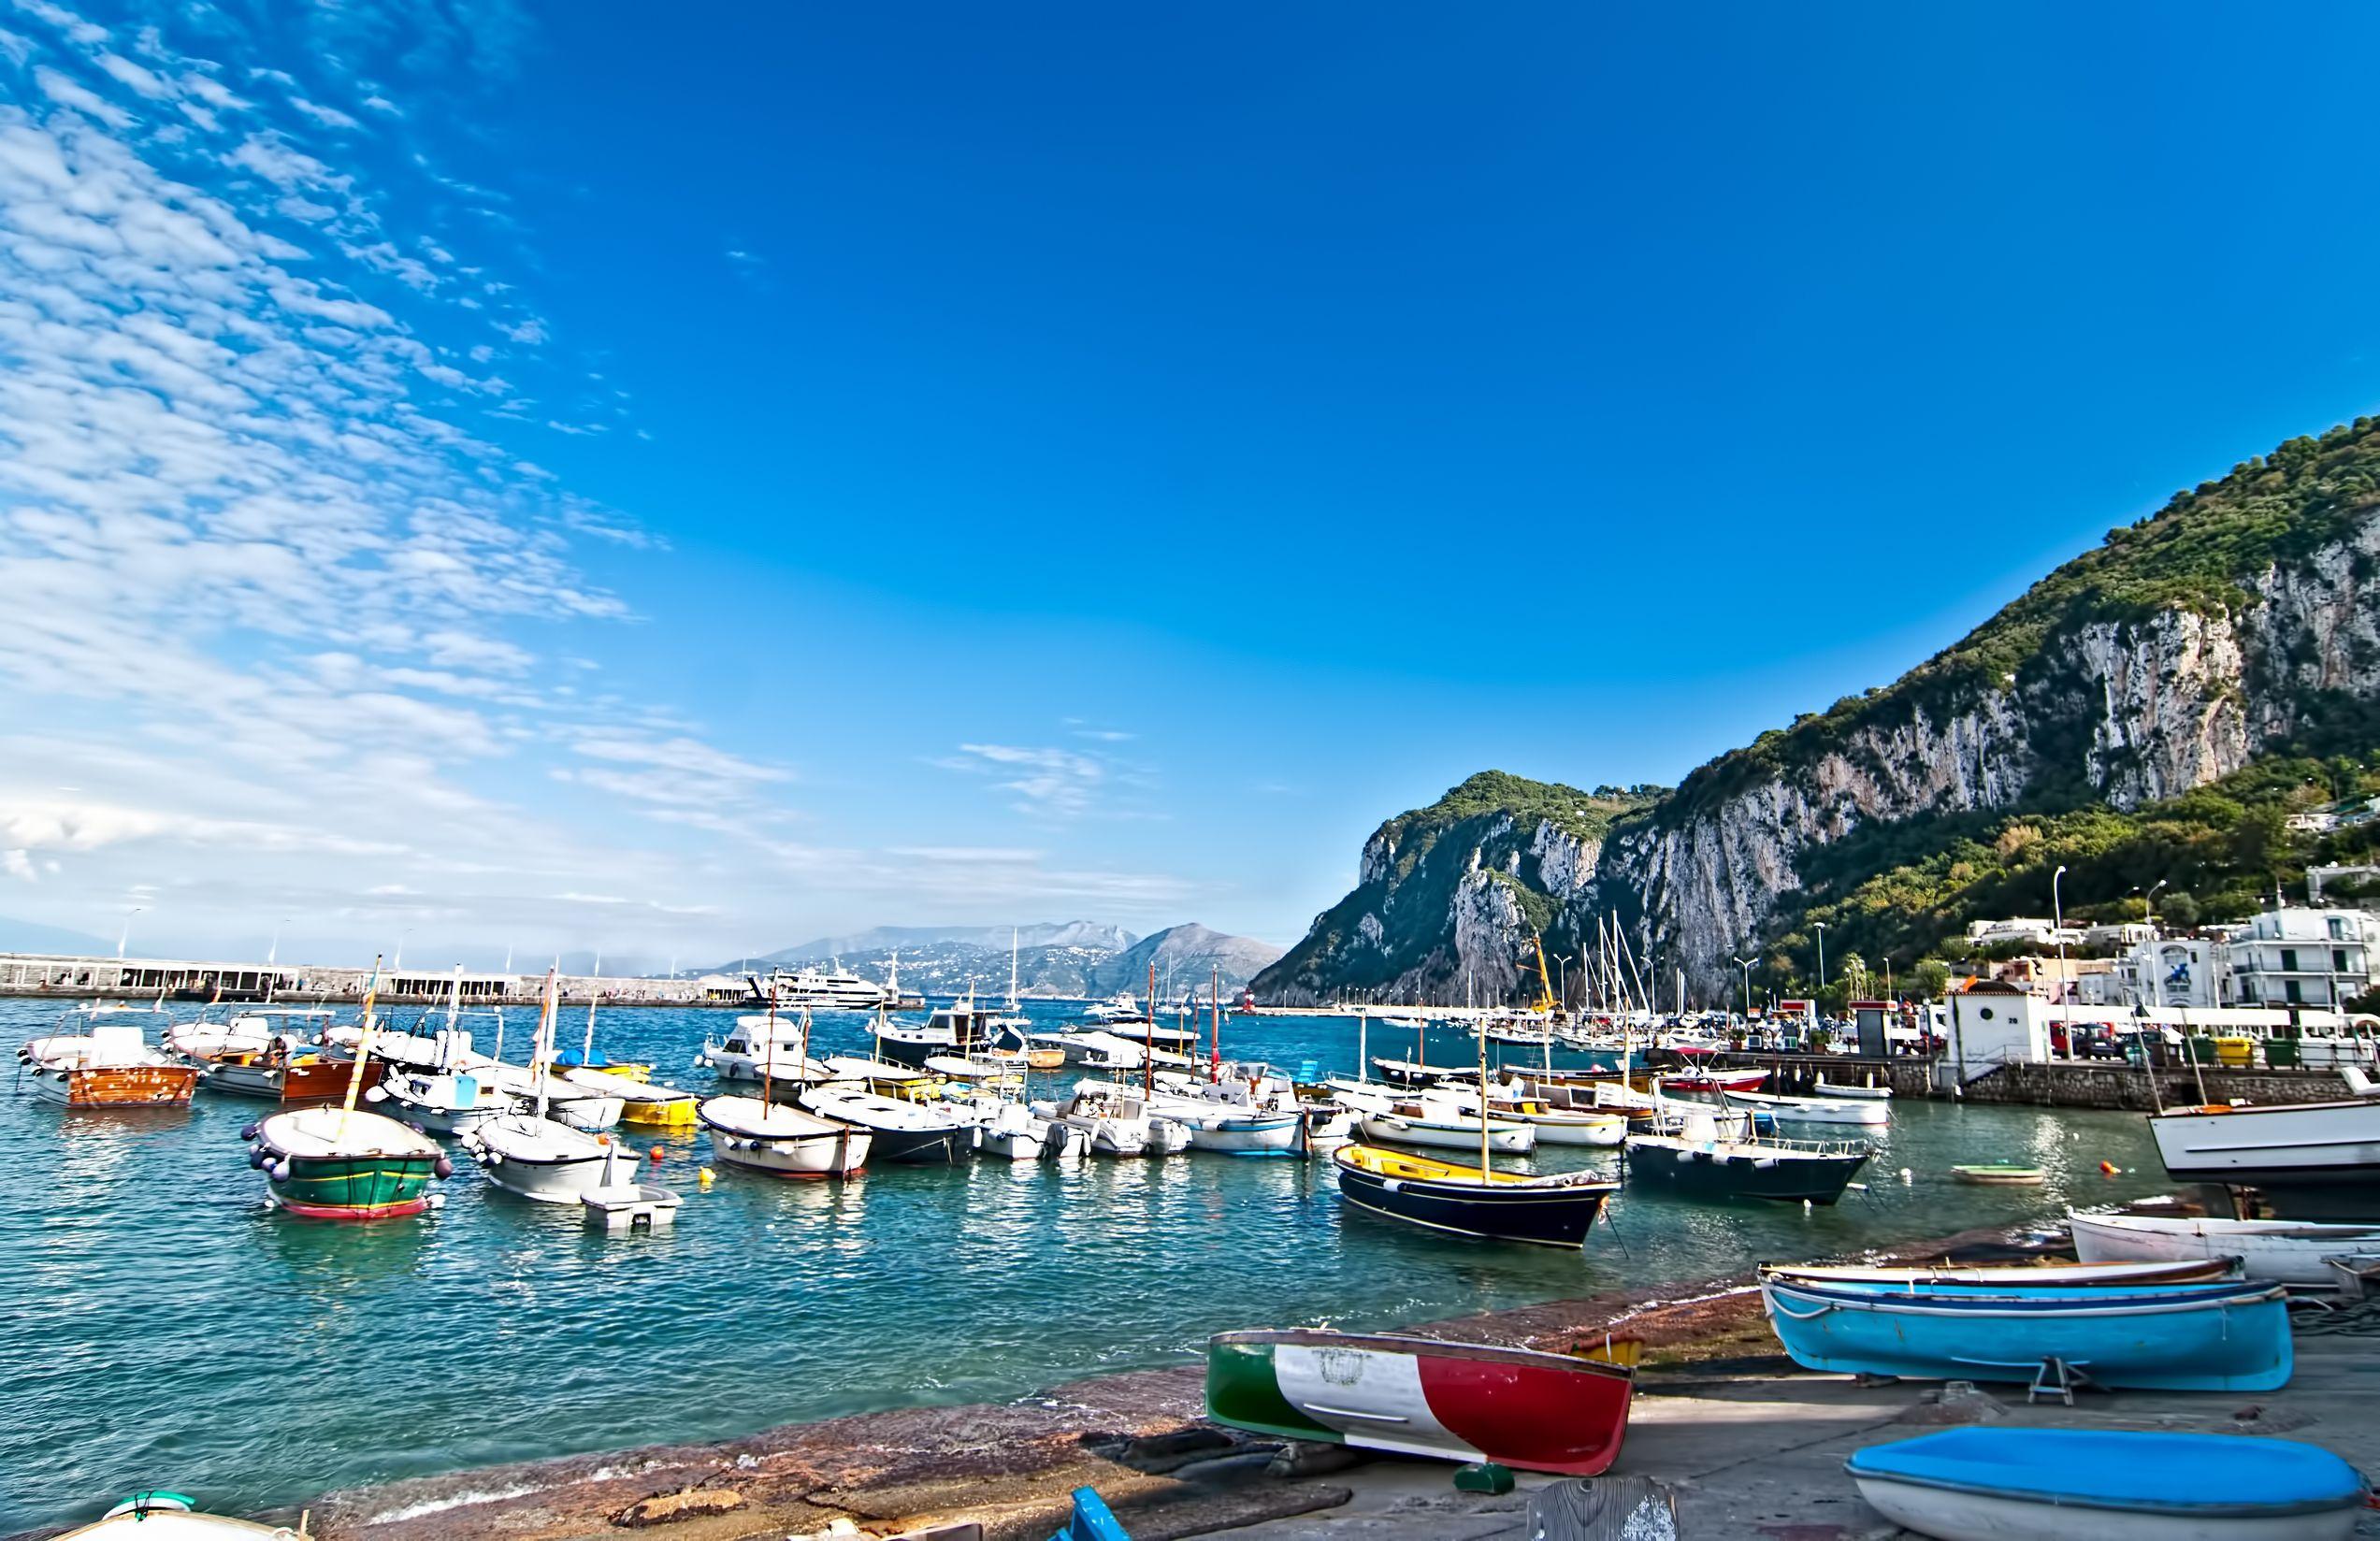 جزيرة كابري إيطاليا